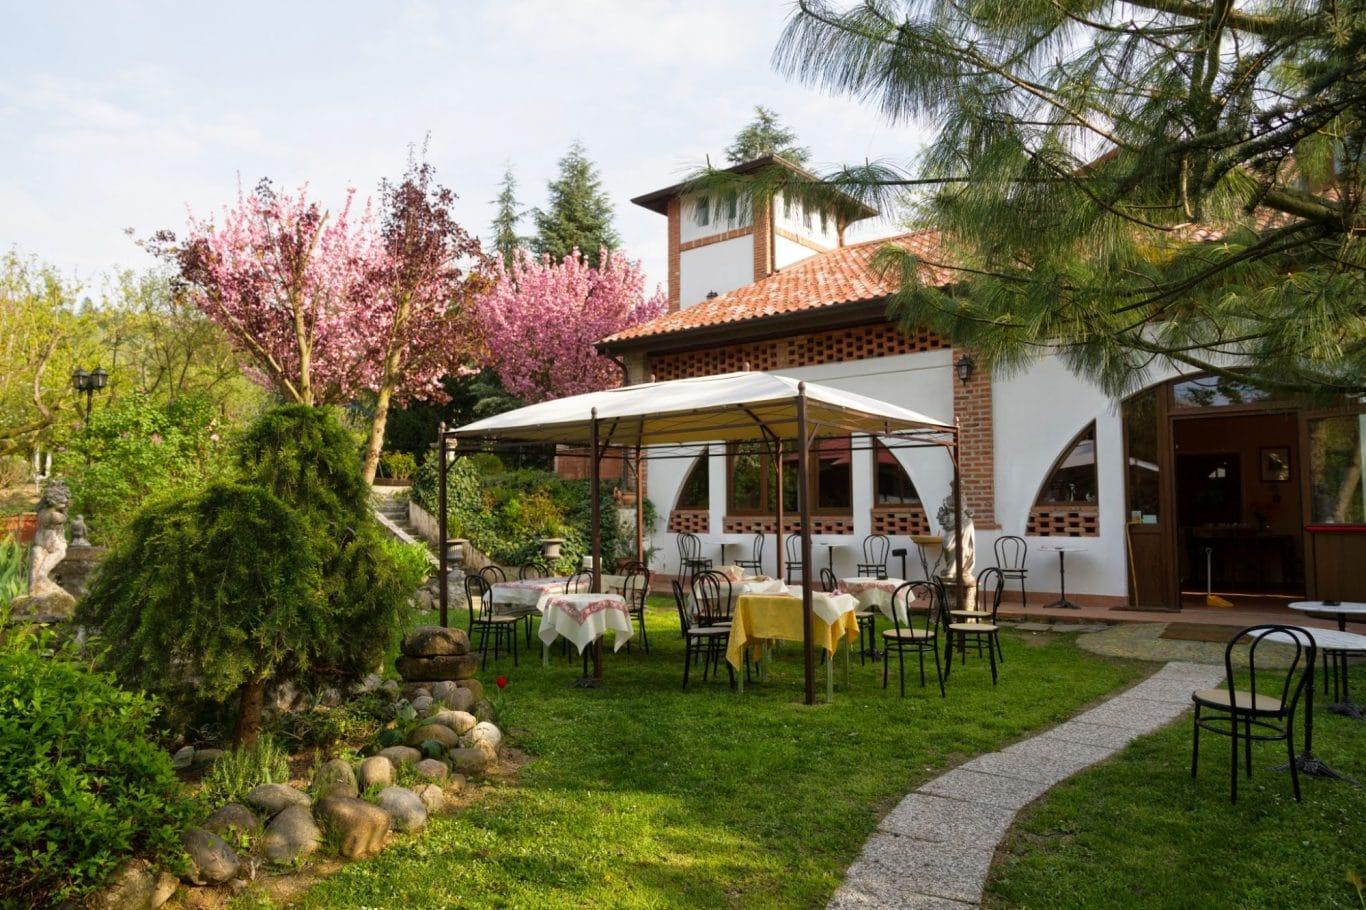 Ristorante domus paradisi cigognola pavia area events - Trattoria con giardino milano ...